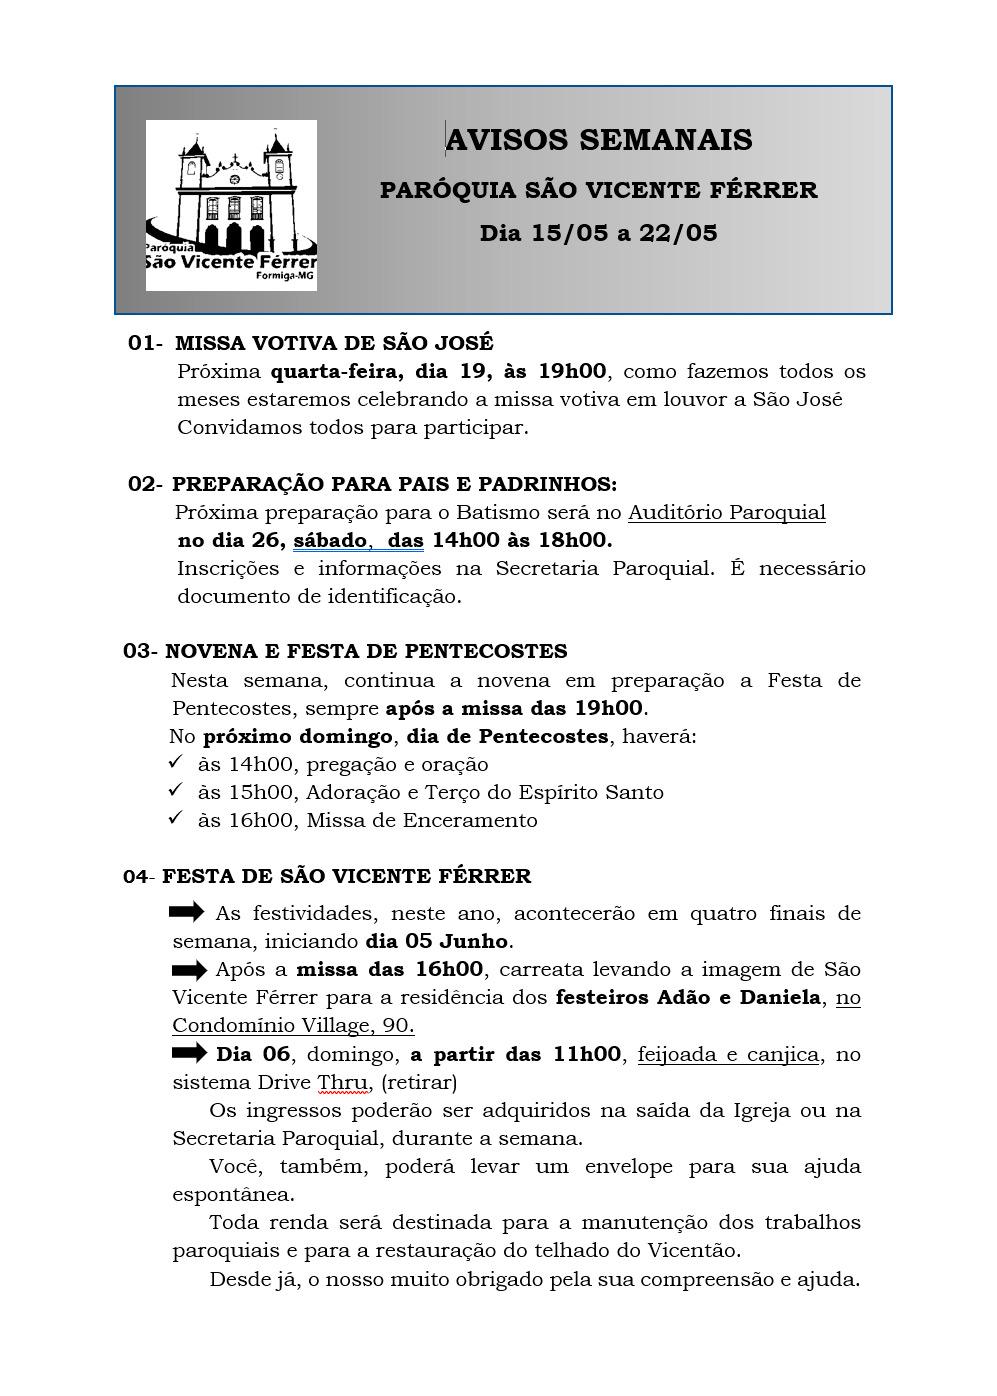 avisossvf15a2205